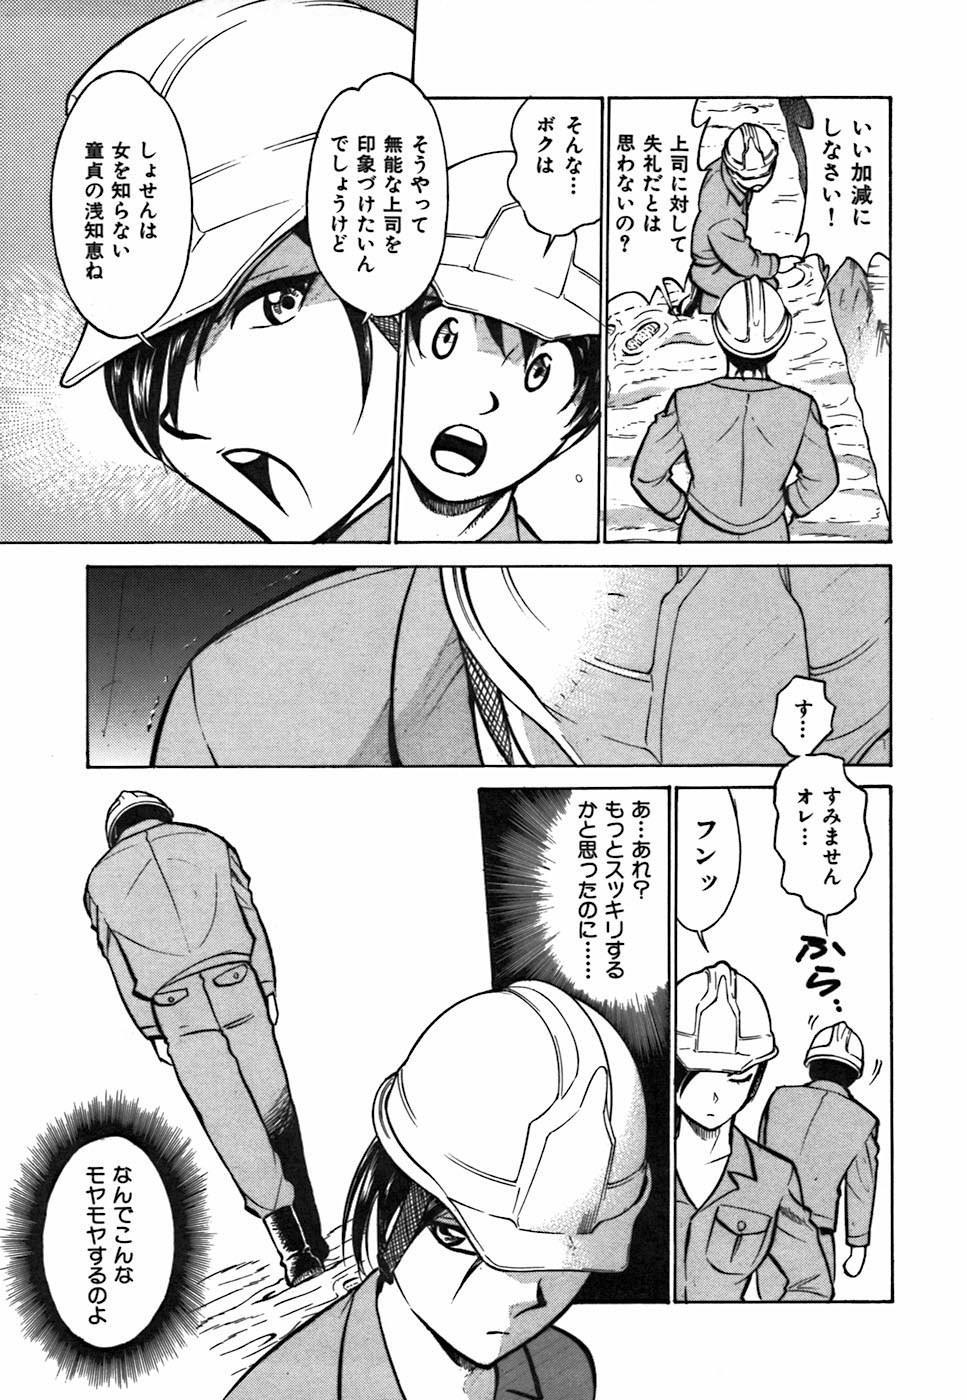 Kimi ga Nozomu Katachi | Appearance for which you hope 50